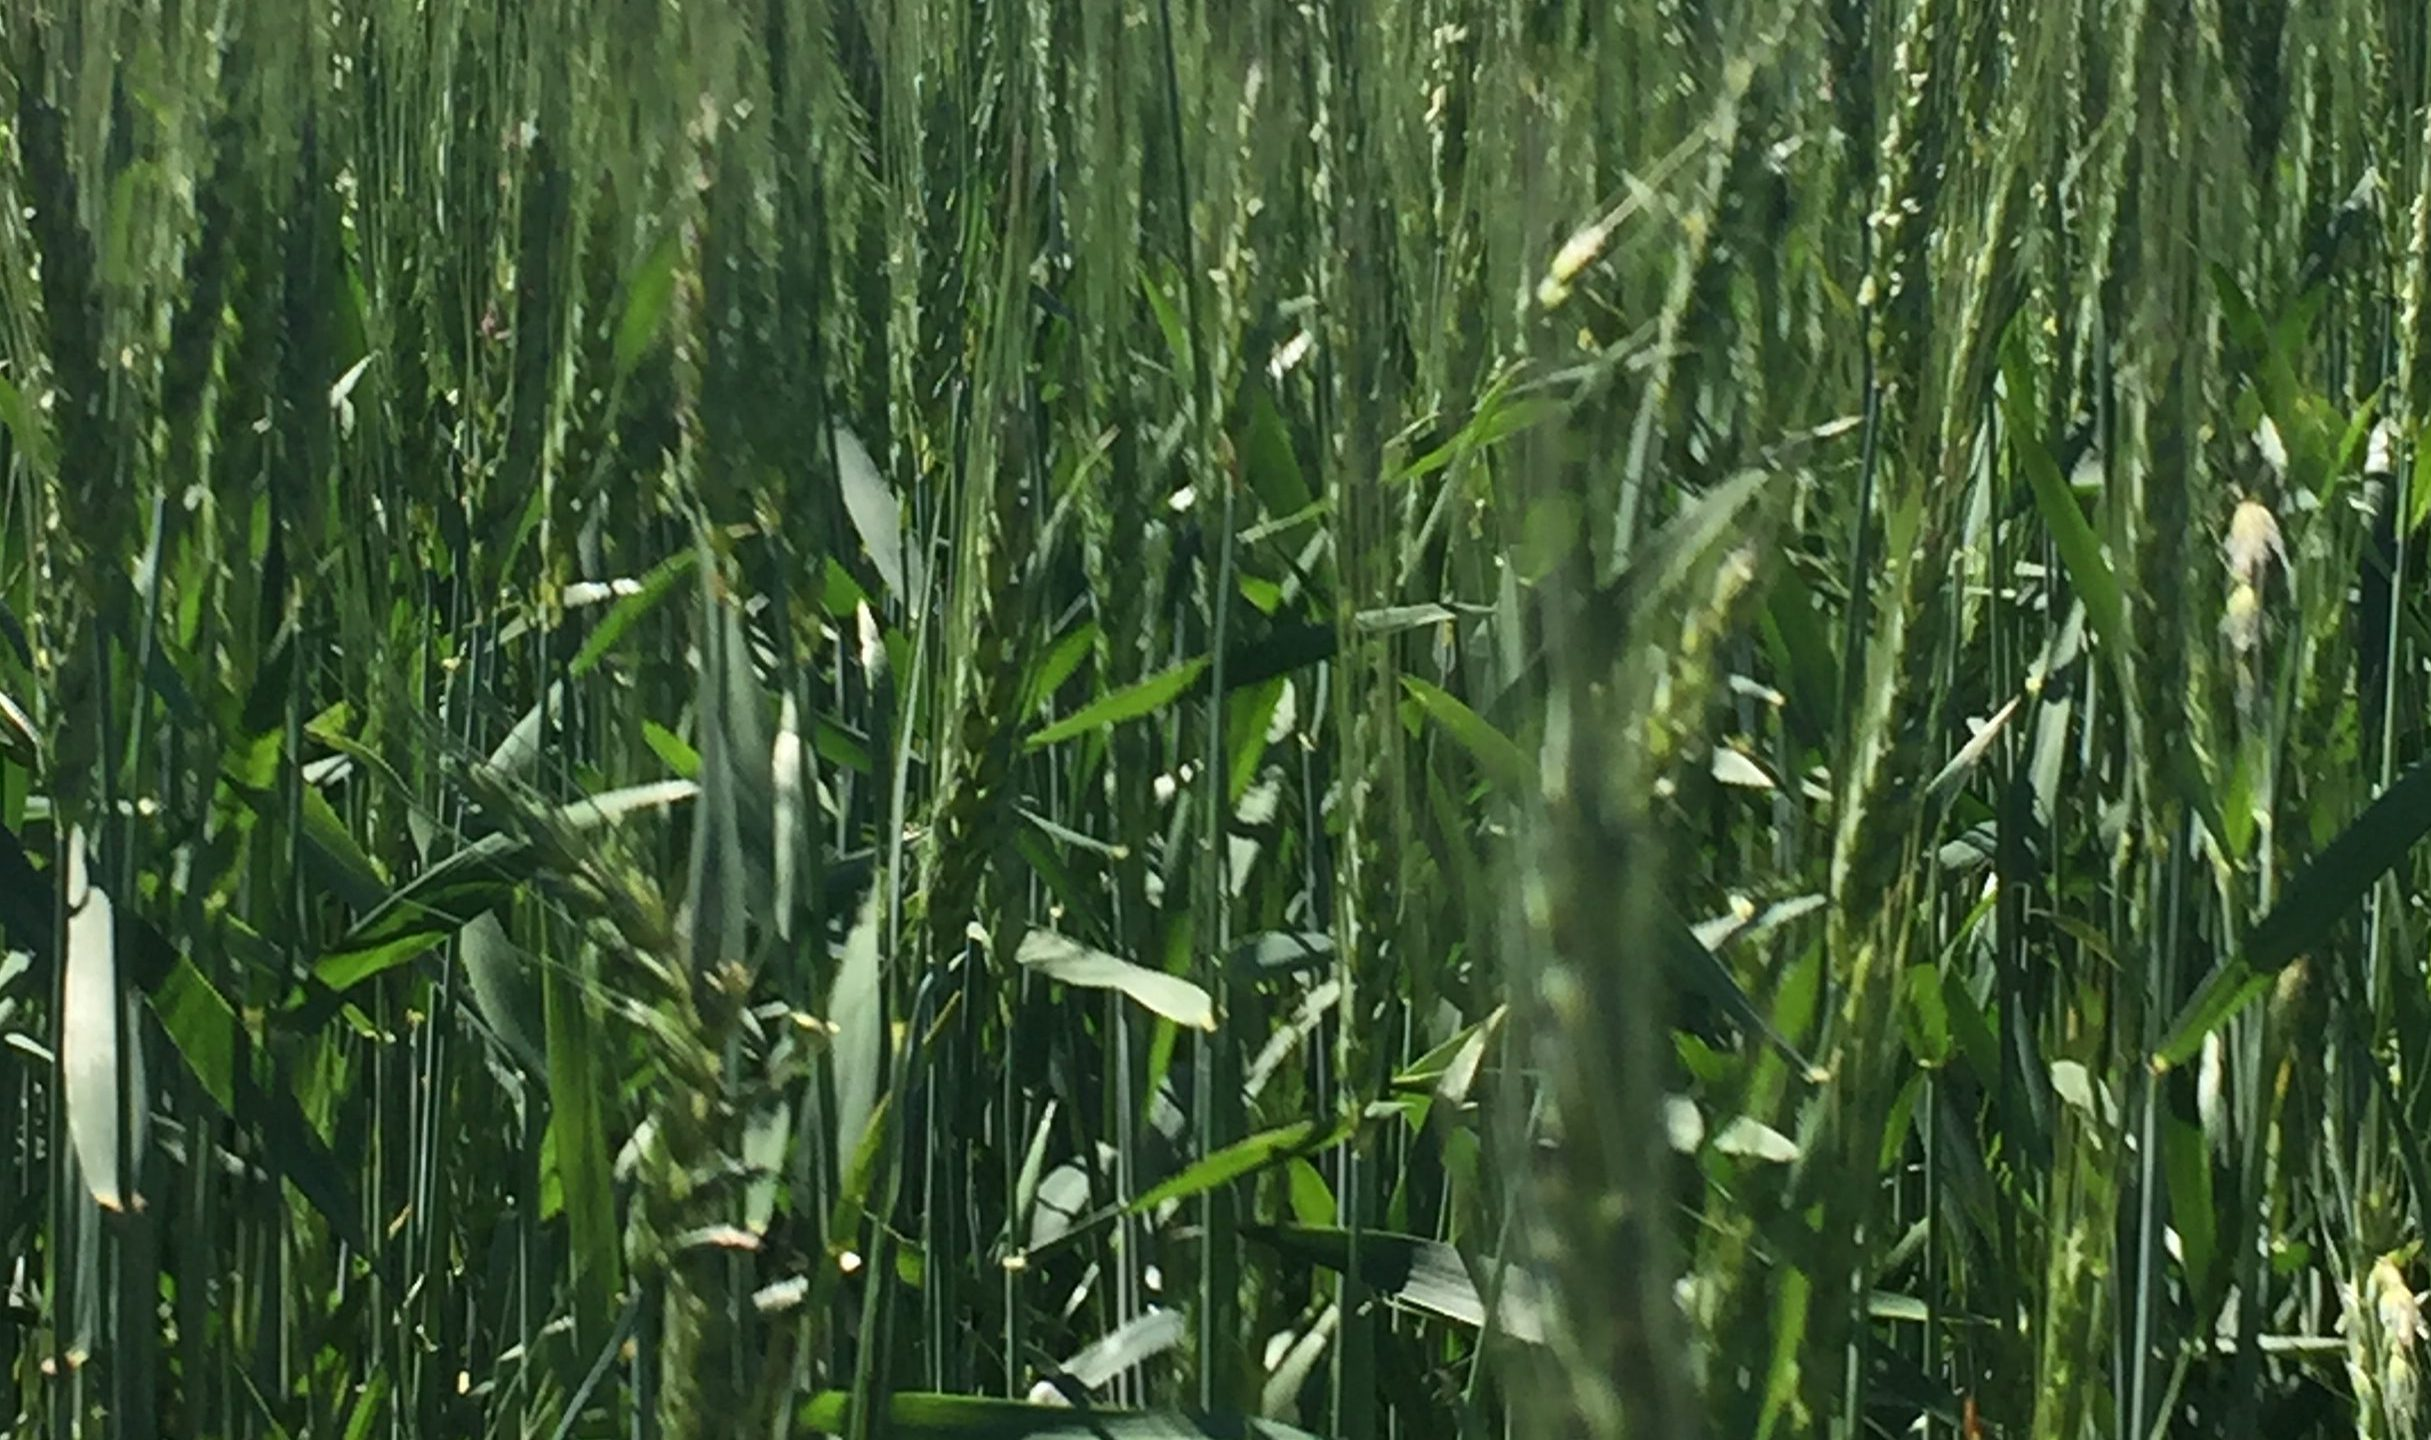 Wheat Crop_275557